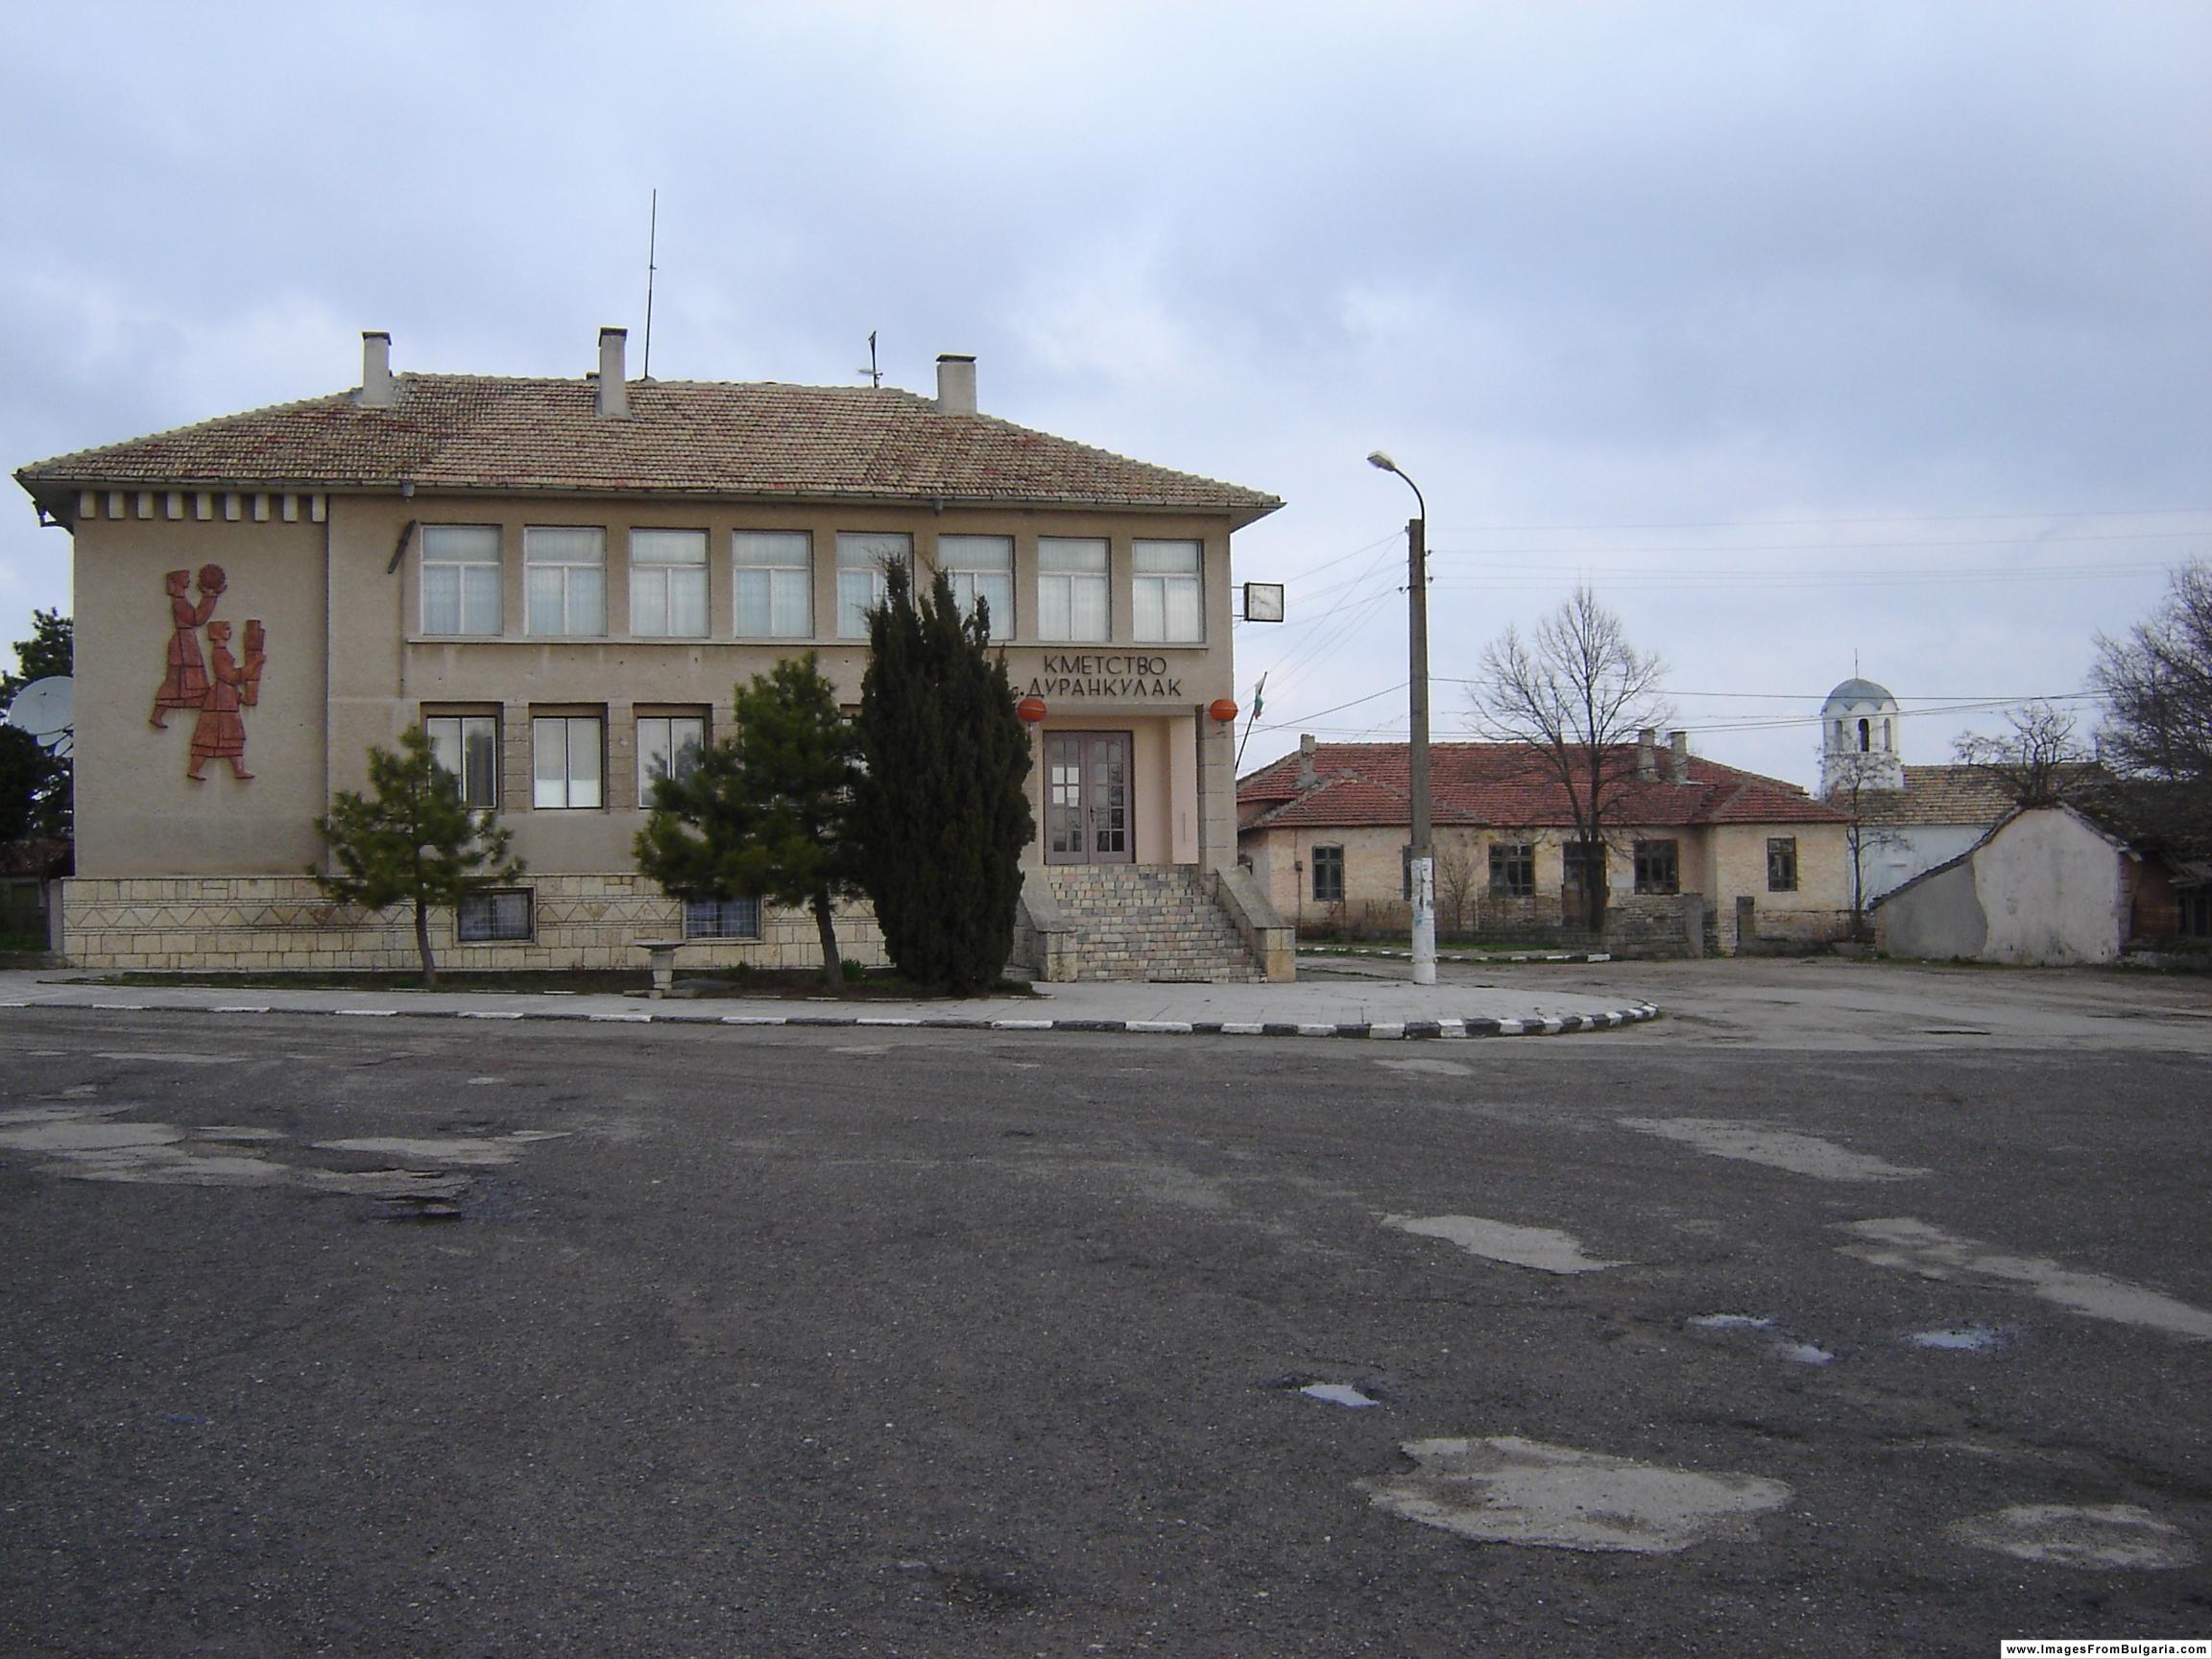 Durankulak, Dobrici